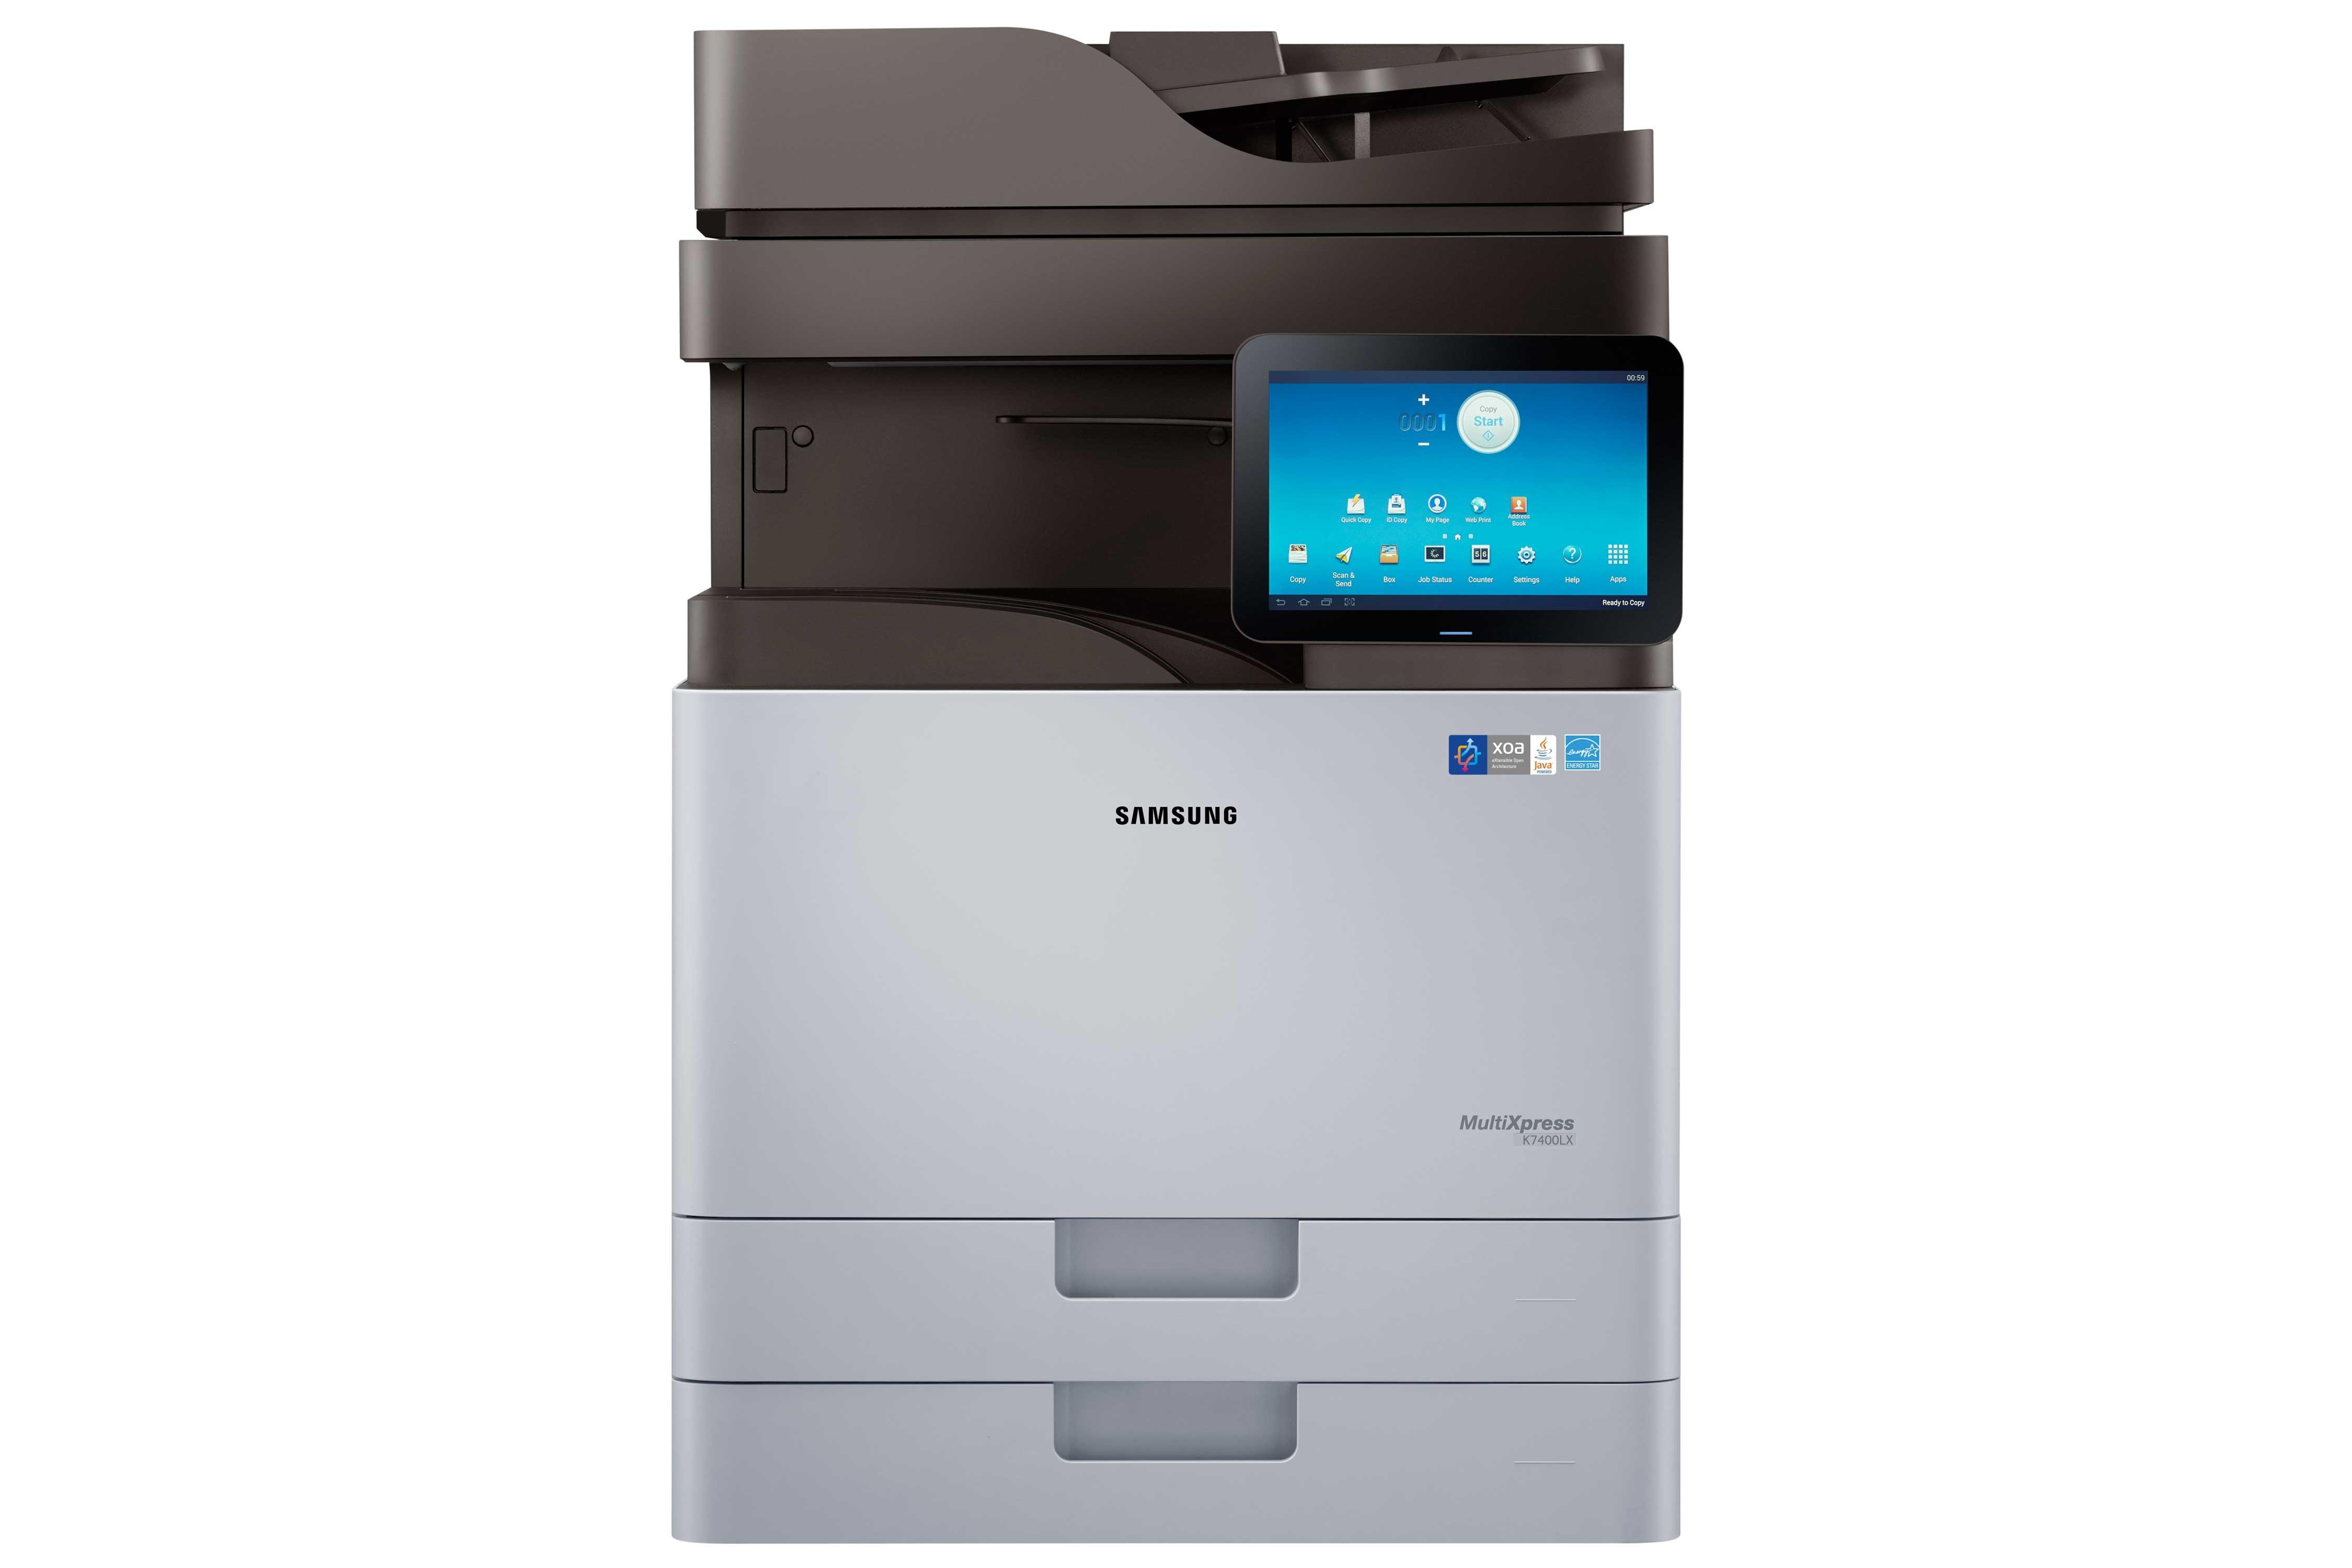 Samsung K7400 Image.jpg